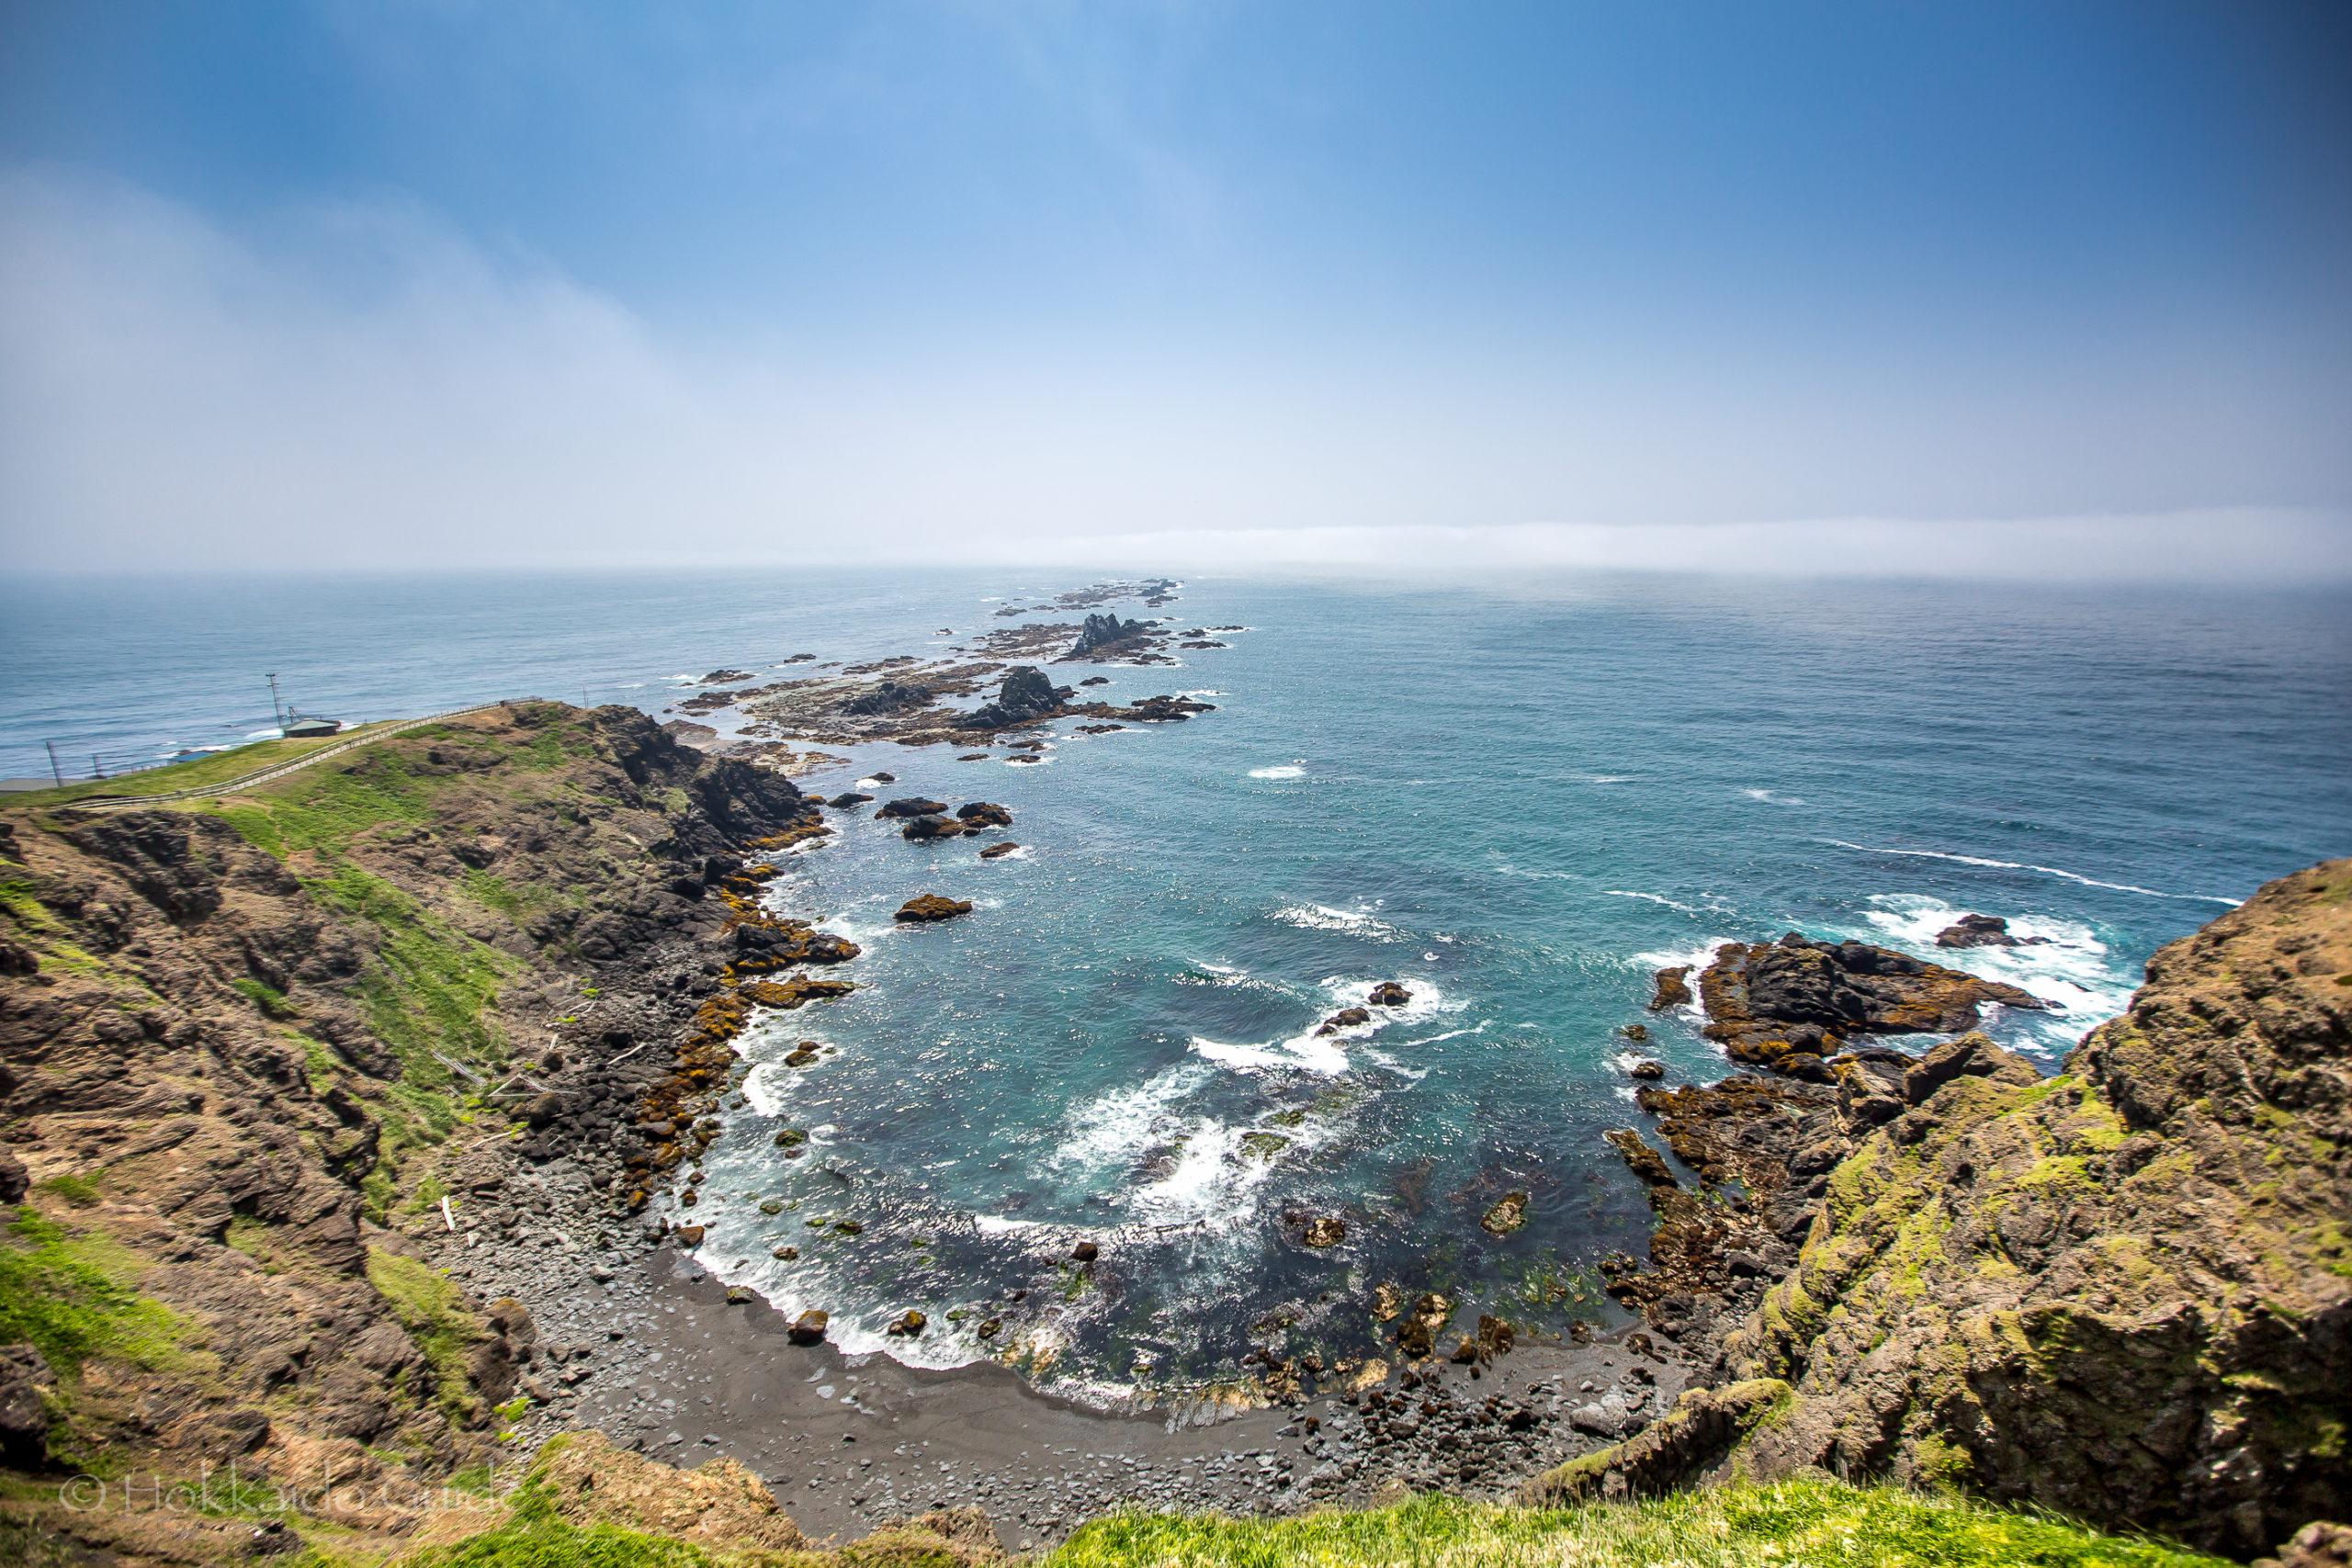 Cape Erimo Lighthouse